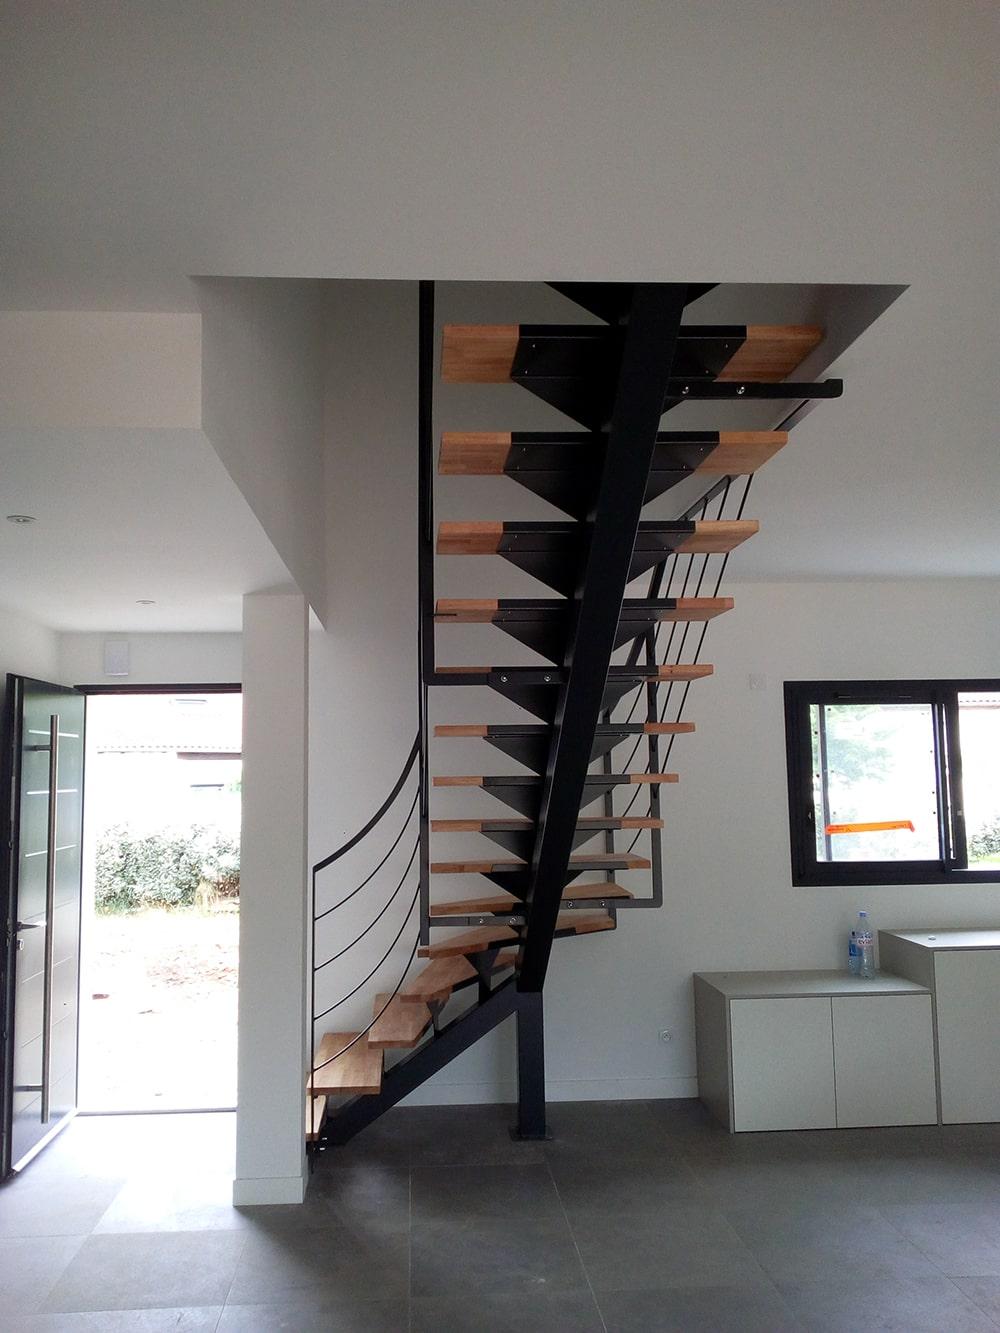 Escalier quart tournant Fer et Tendance